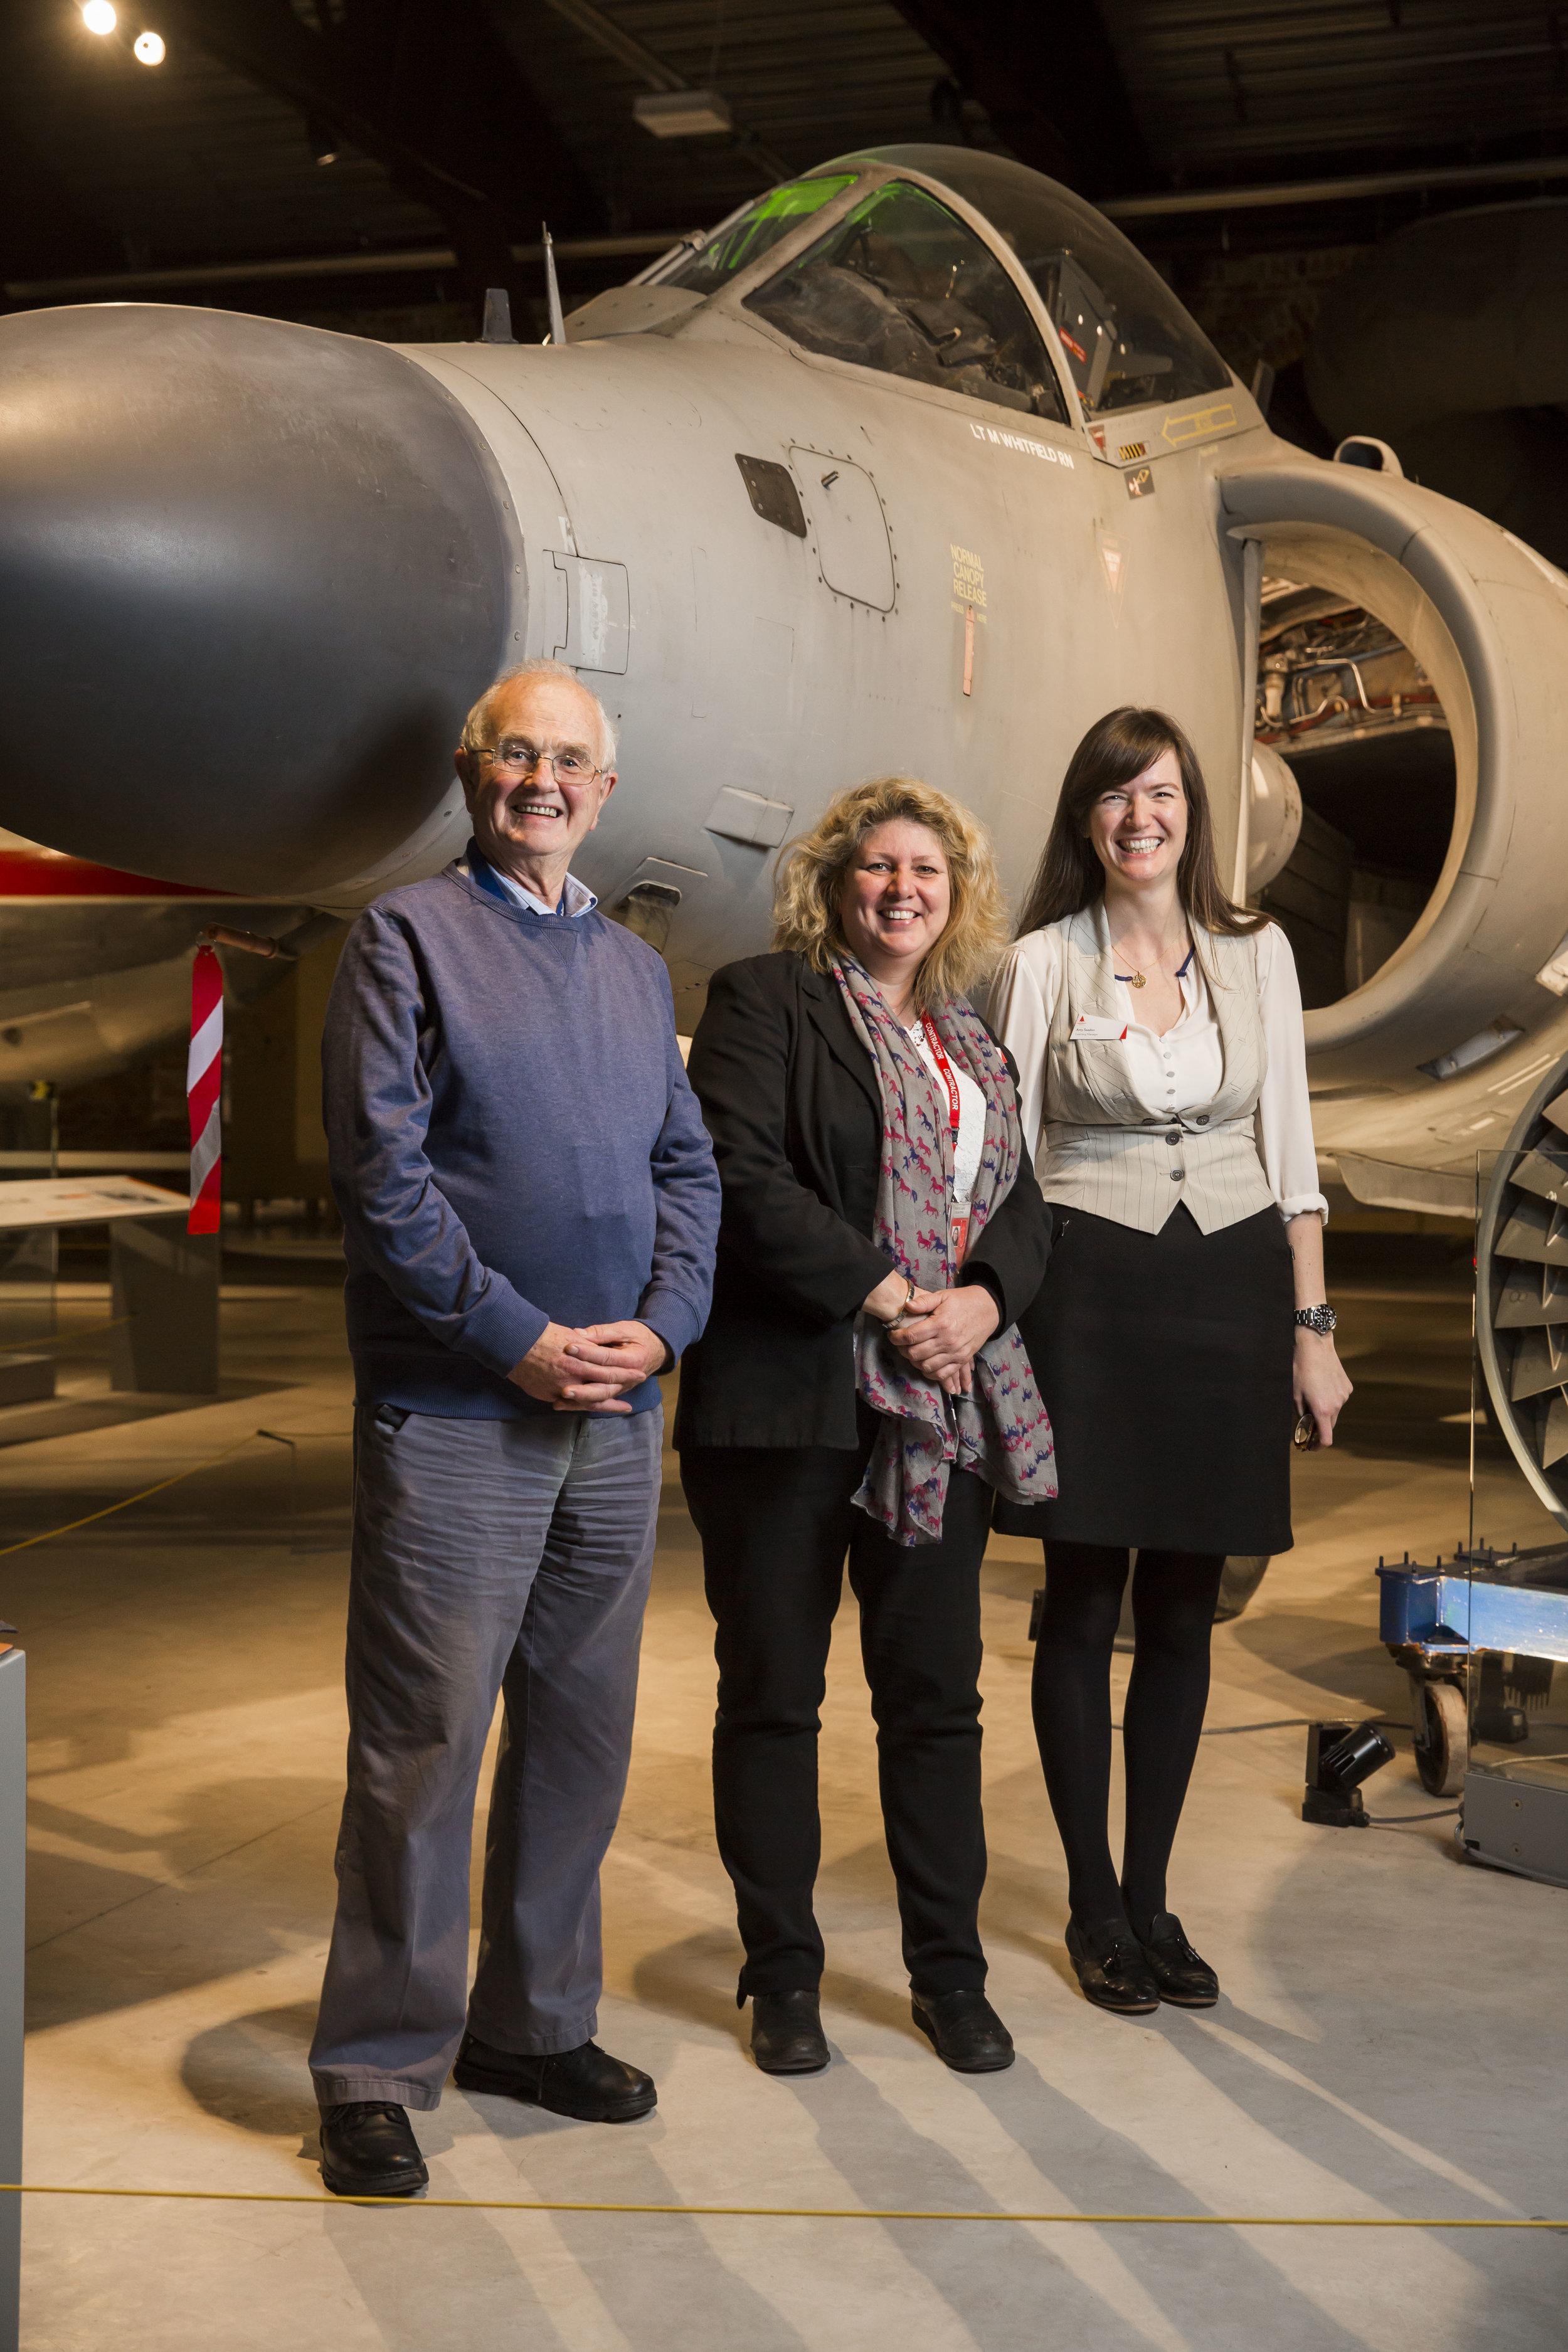 Aerospace_Bristol_Volunteers_31.JPG